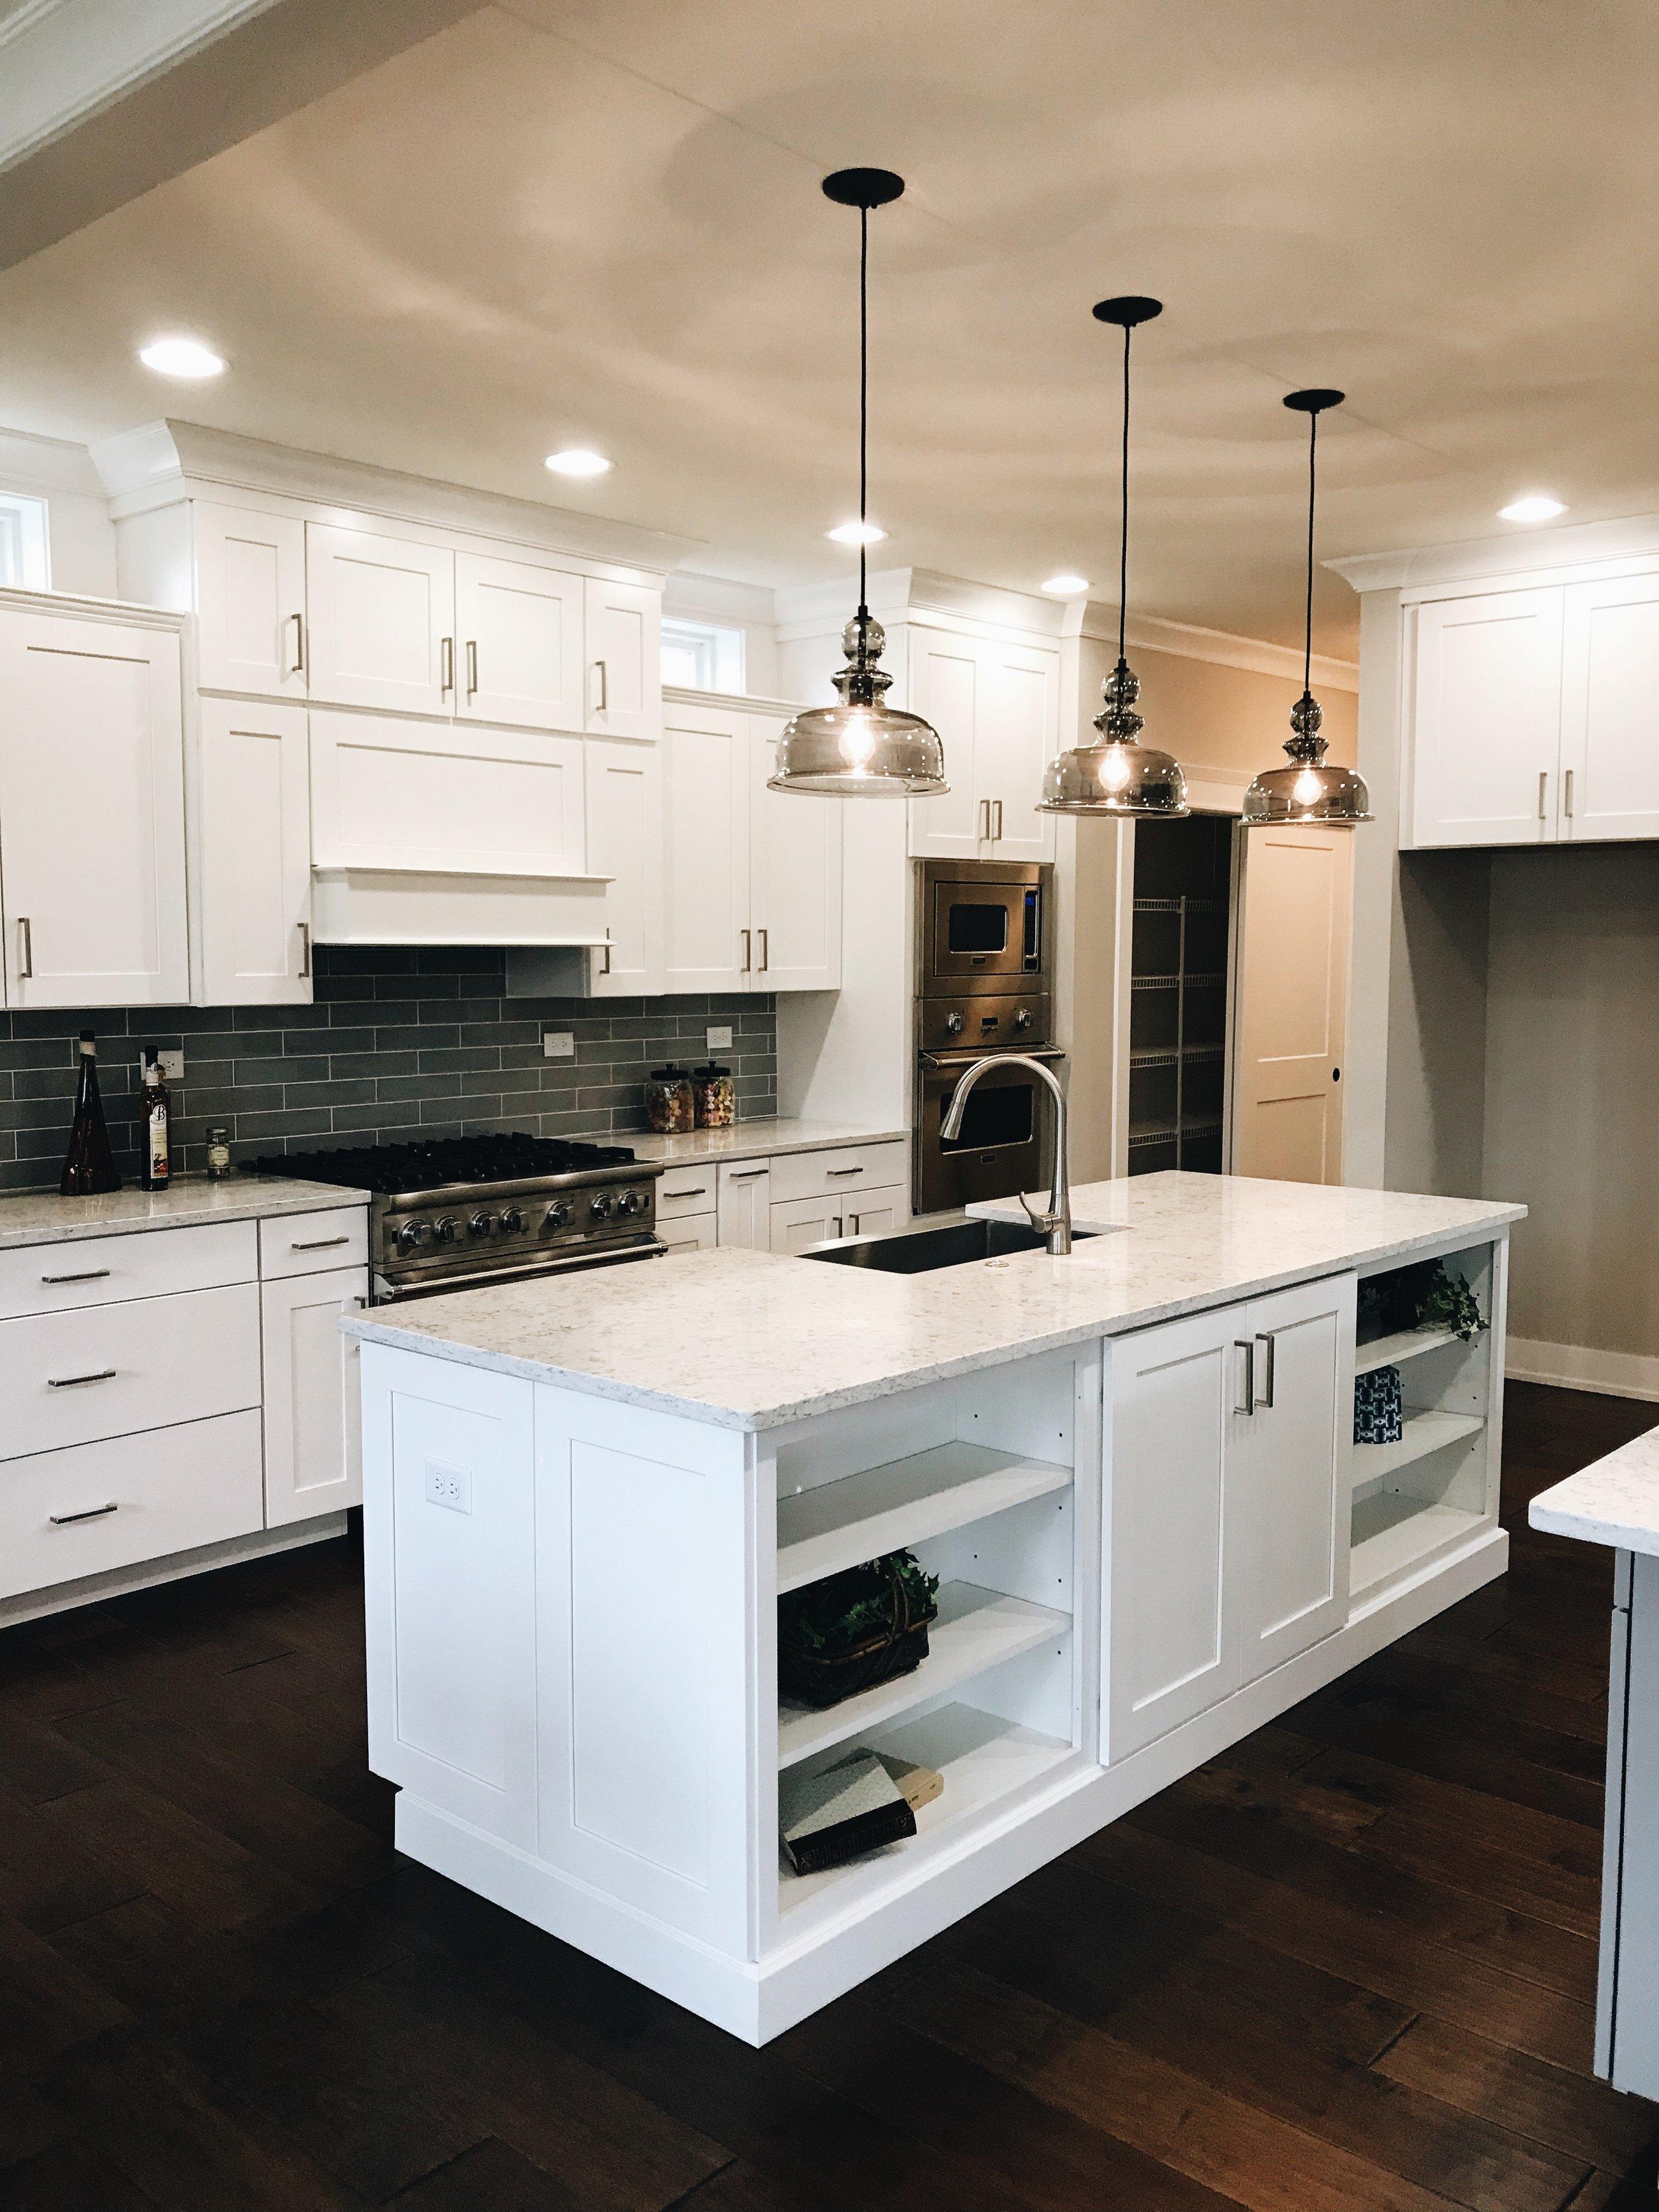 Kitchen Island Design. New Kitchen Design. Lighting for kitchen.